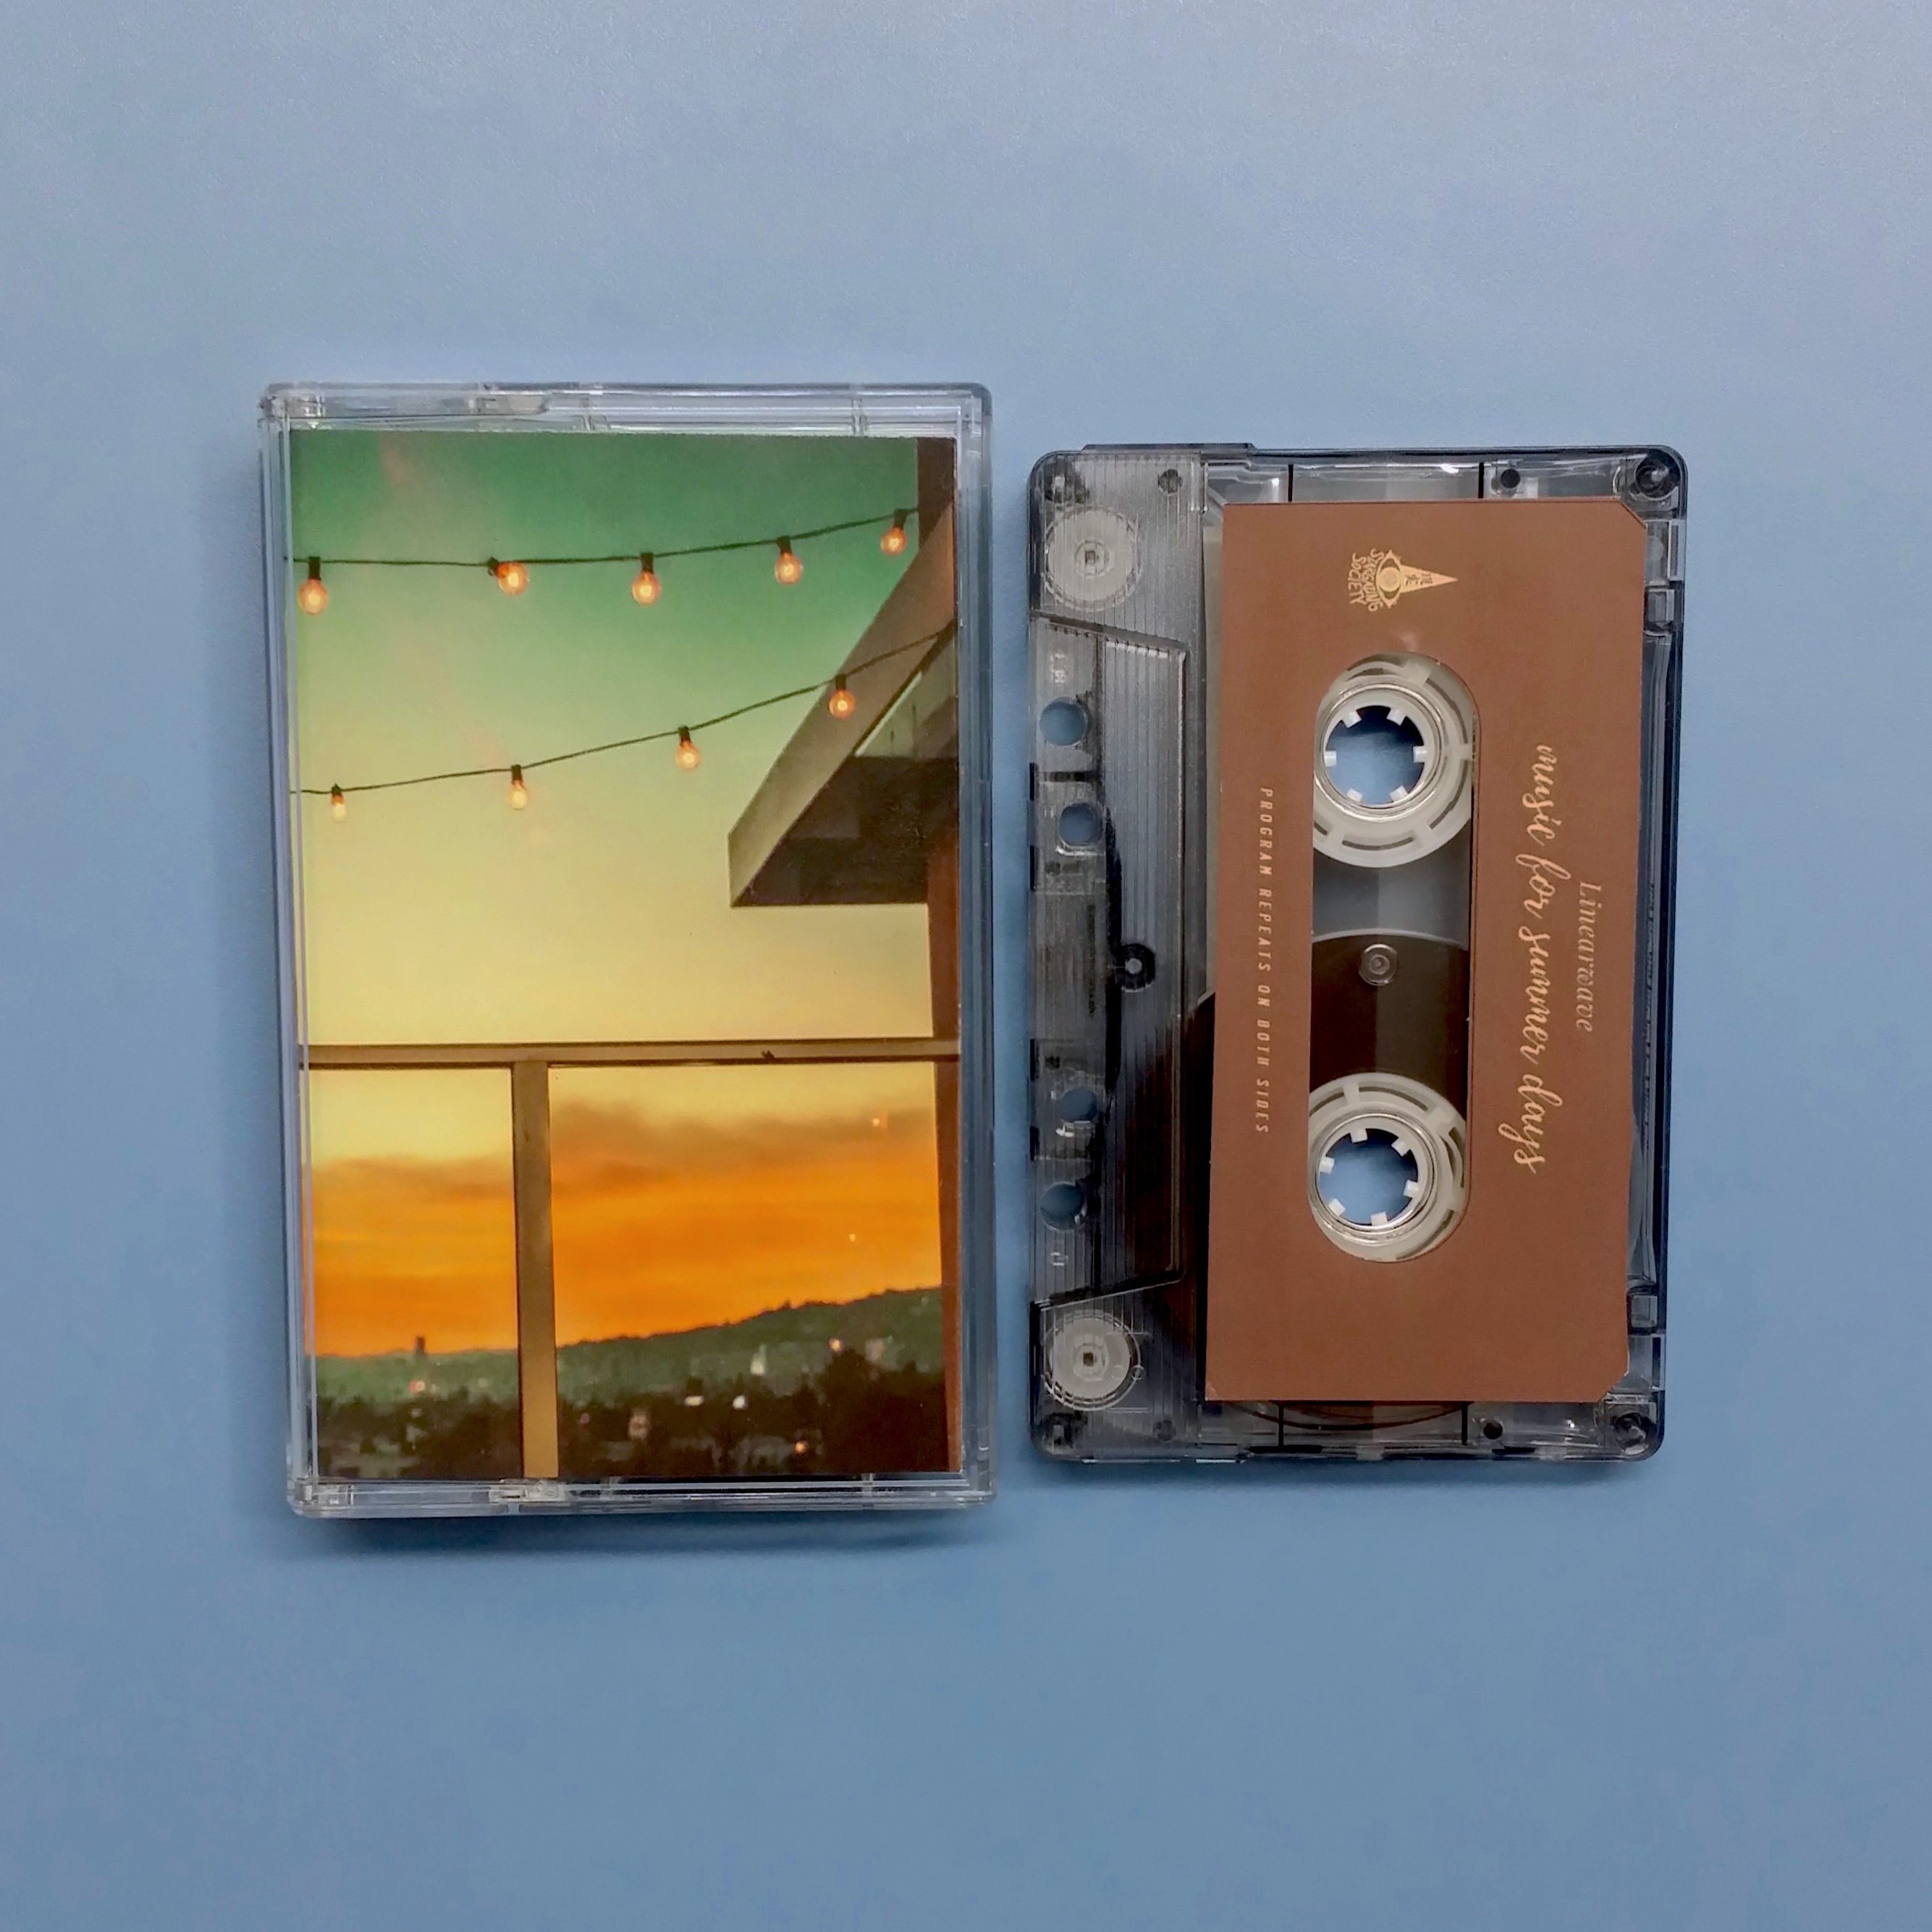 Linearwave - Music for Summer Days (Genjitsu Stargazing Society)